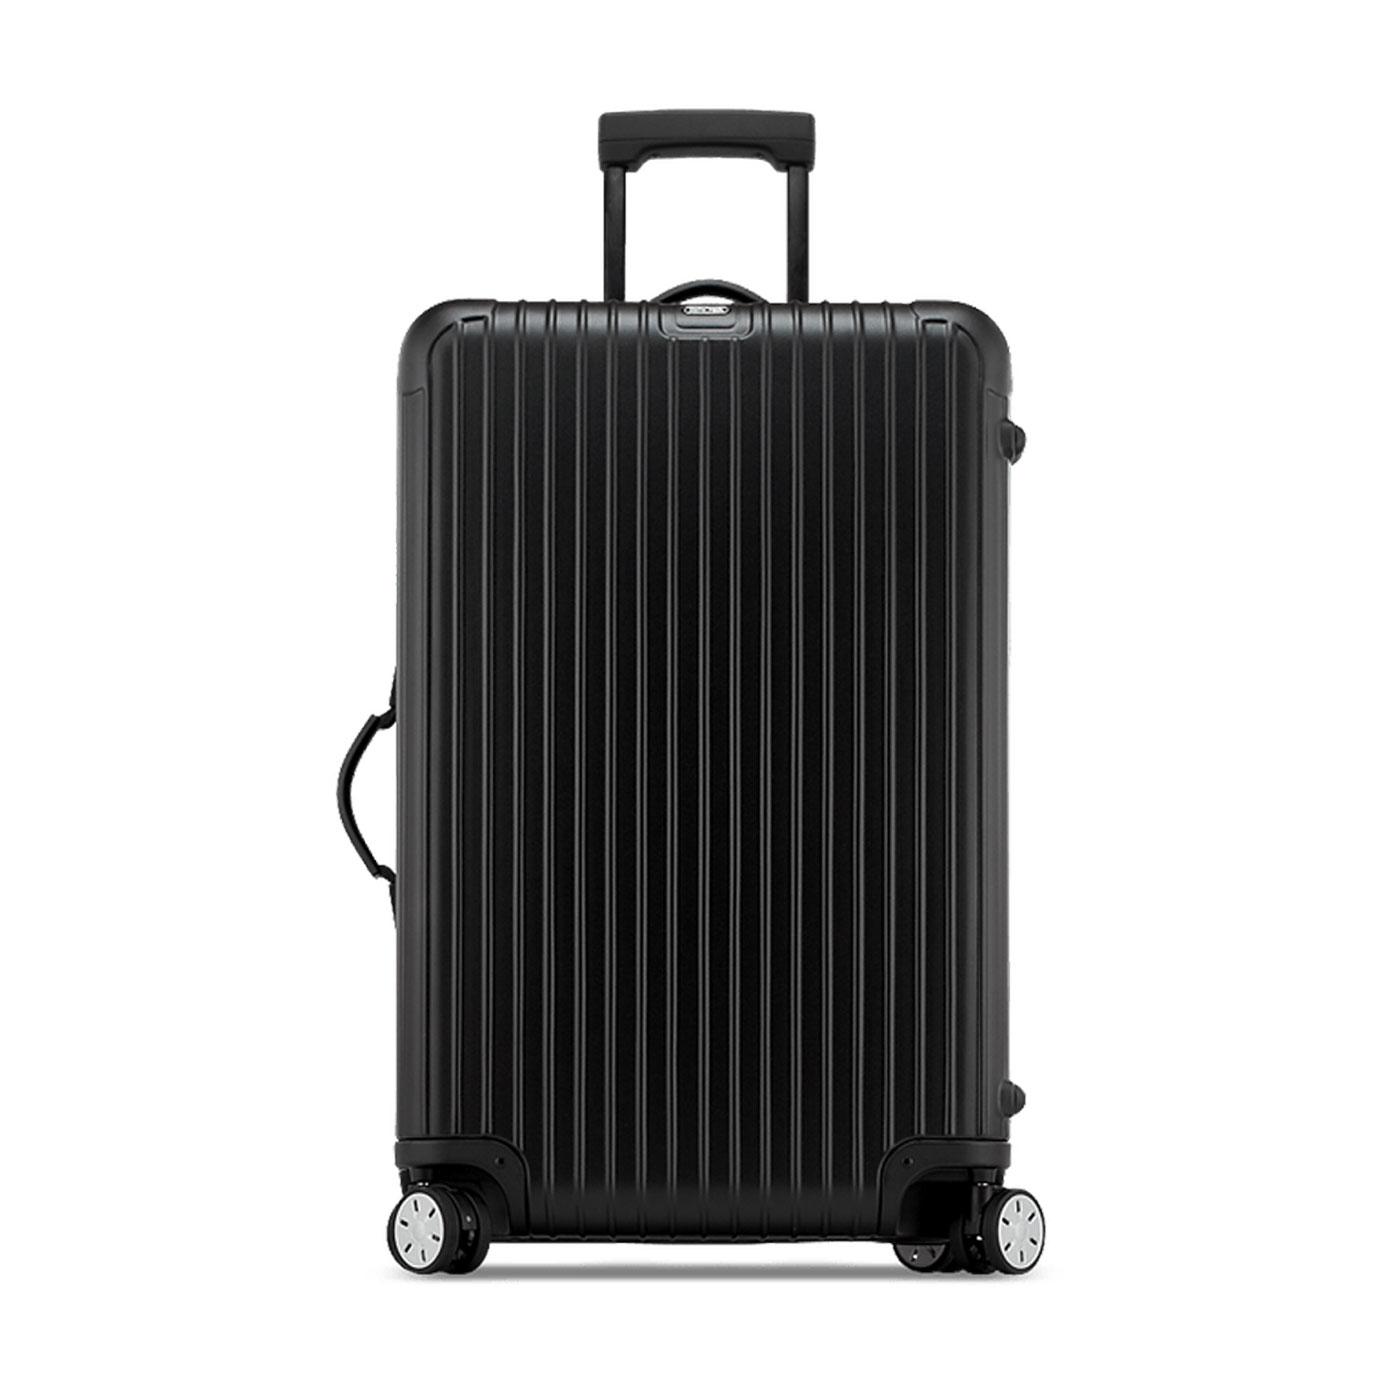 RIMOWA-Black-Luggage.jpg